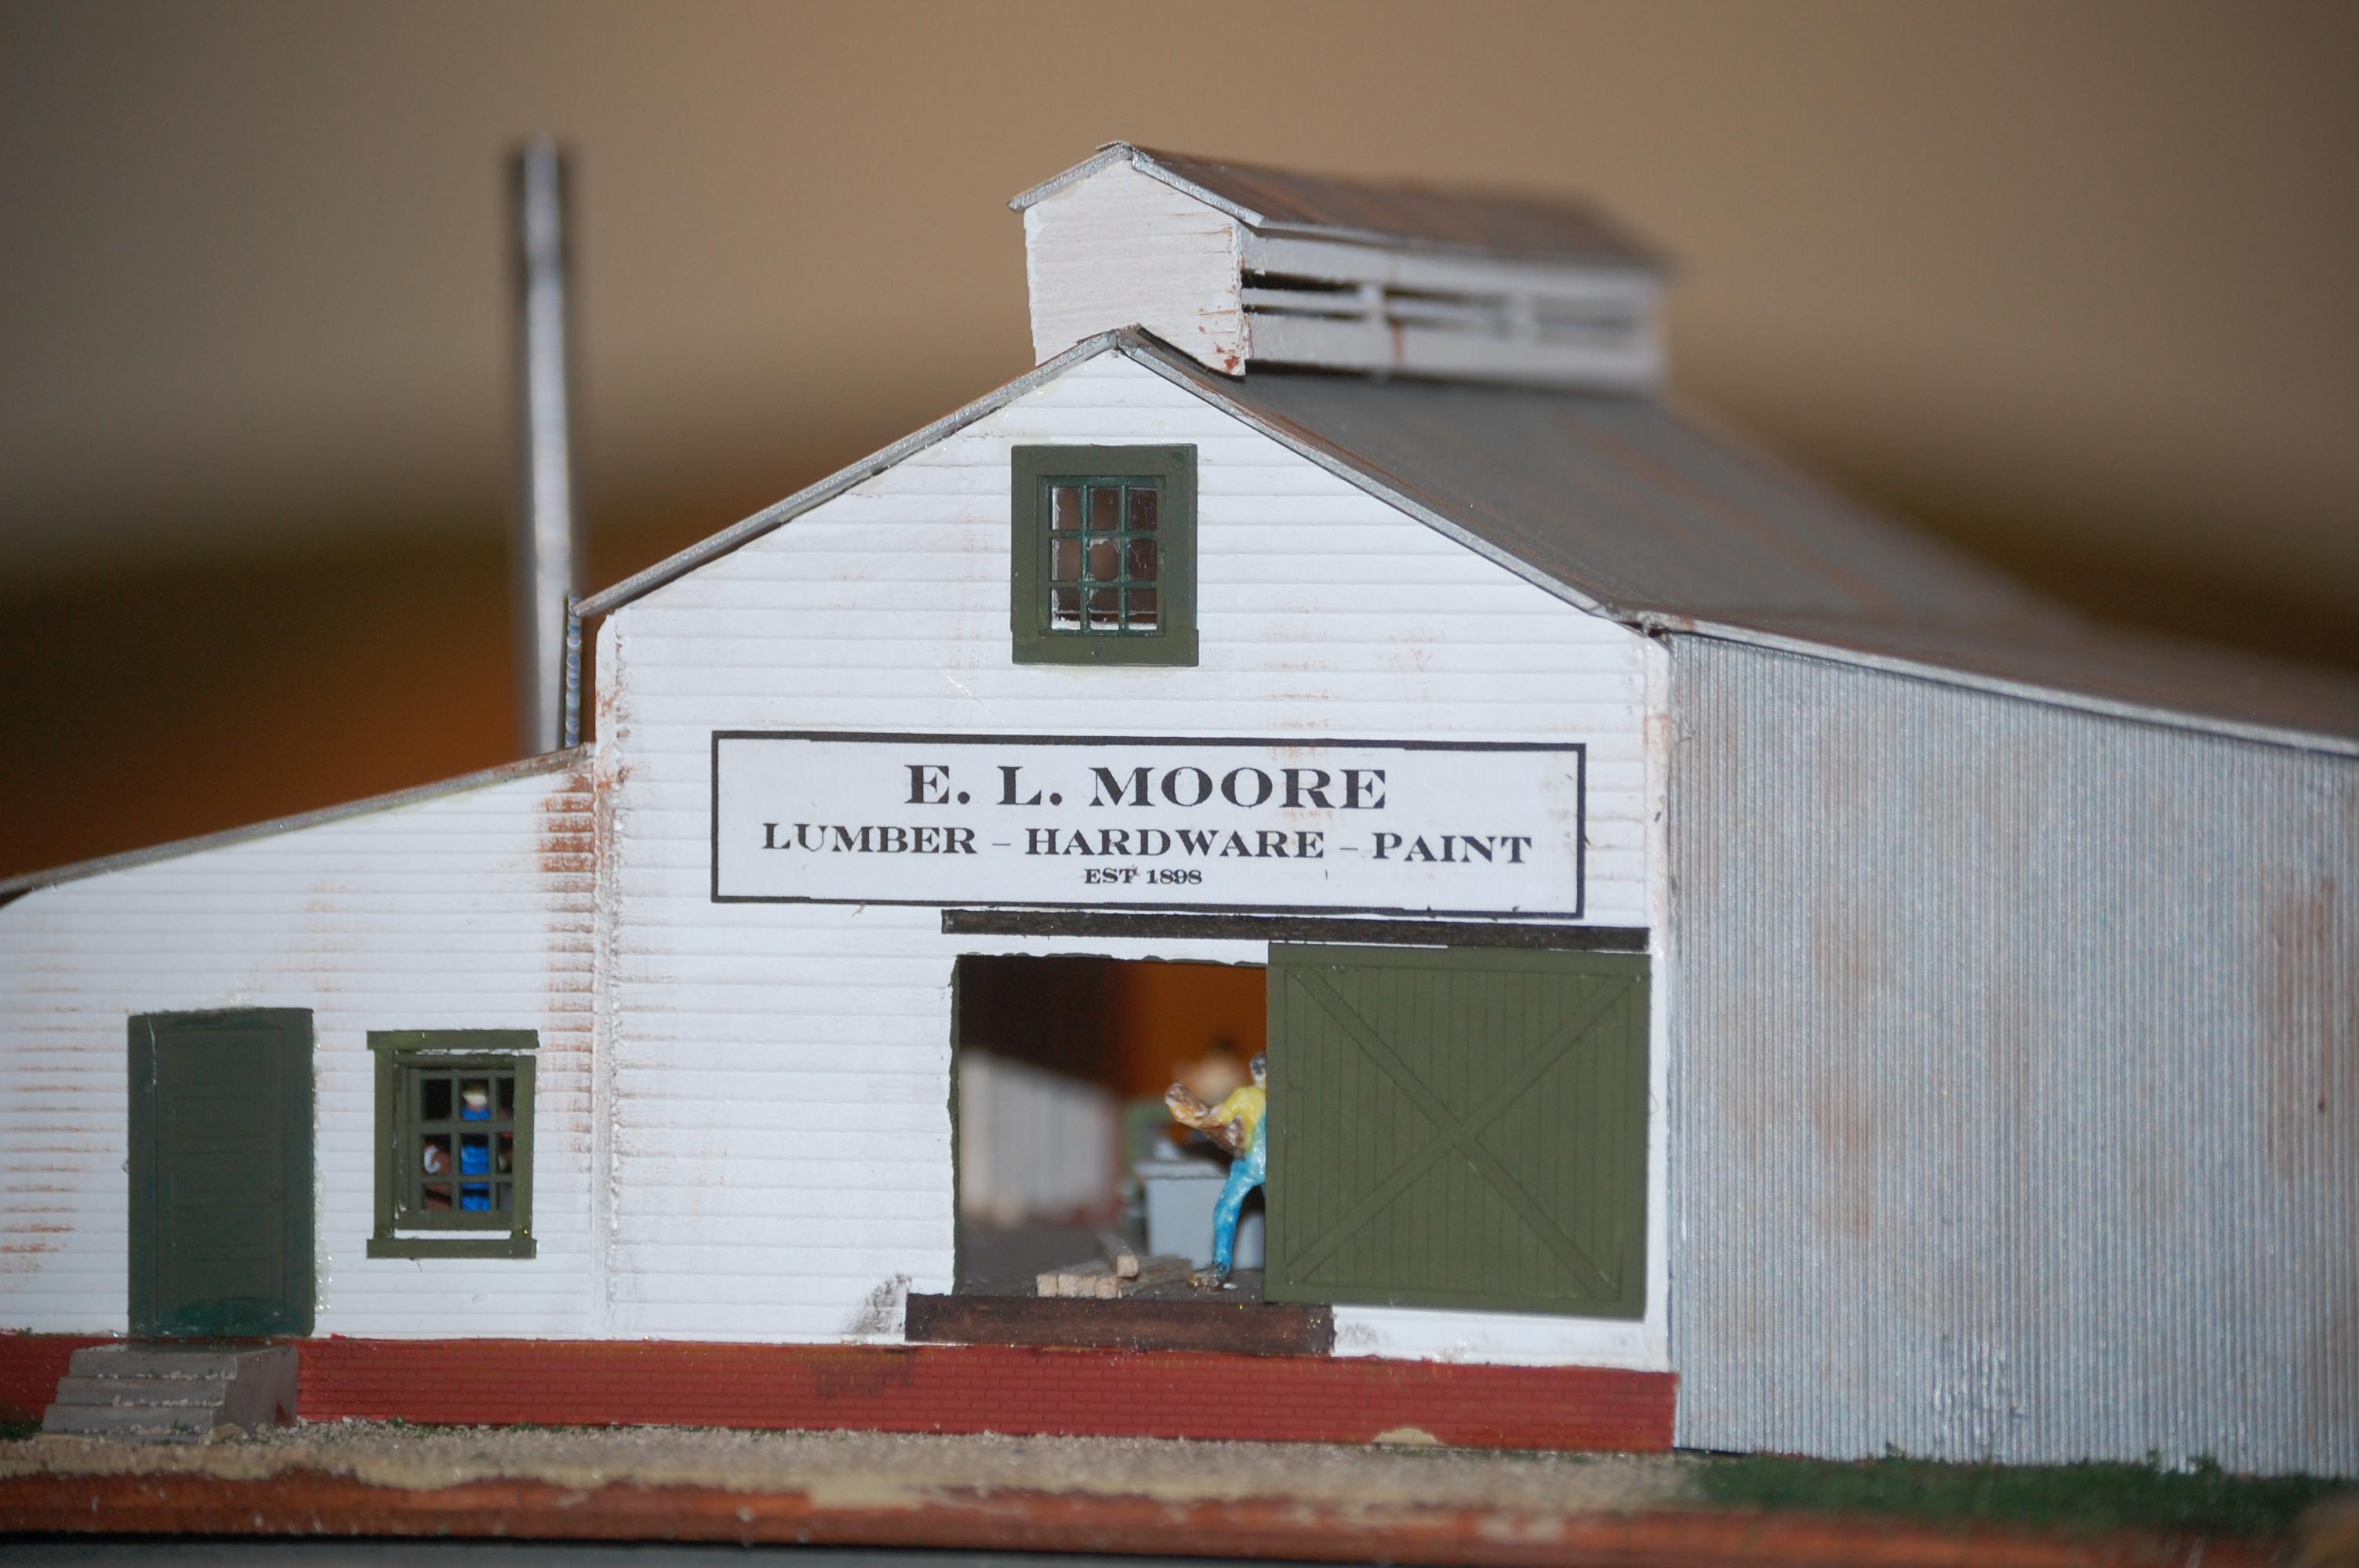 E L Moore Lumber